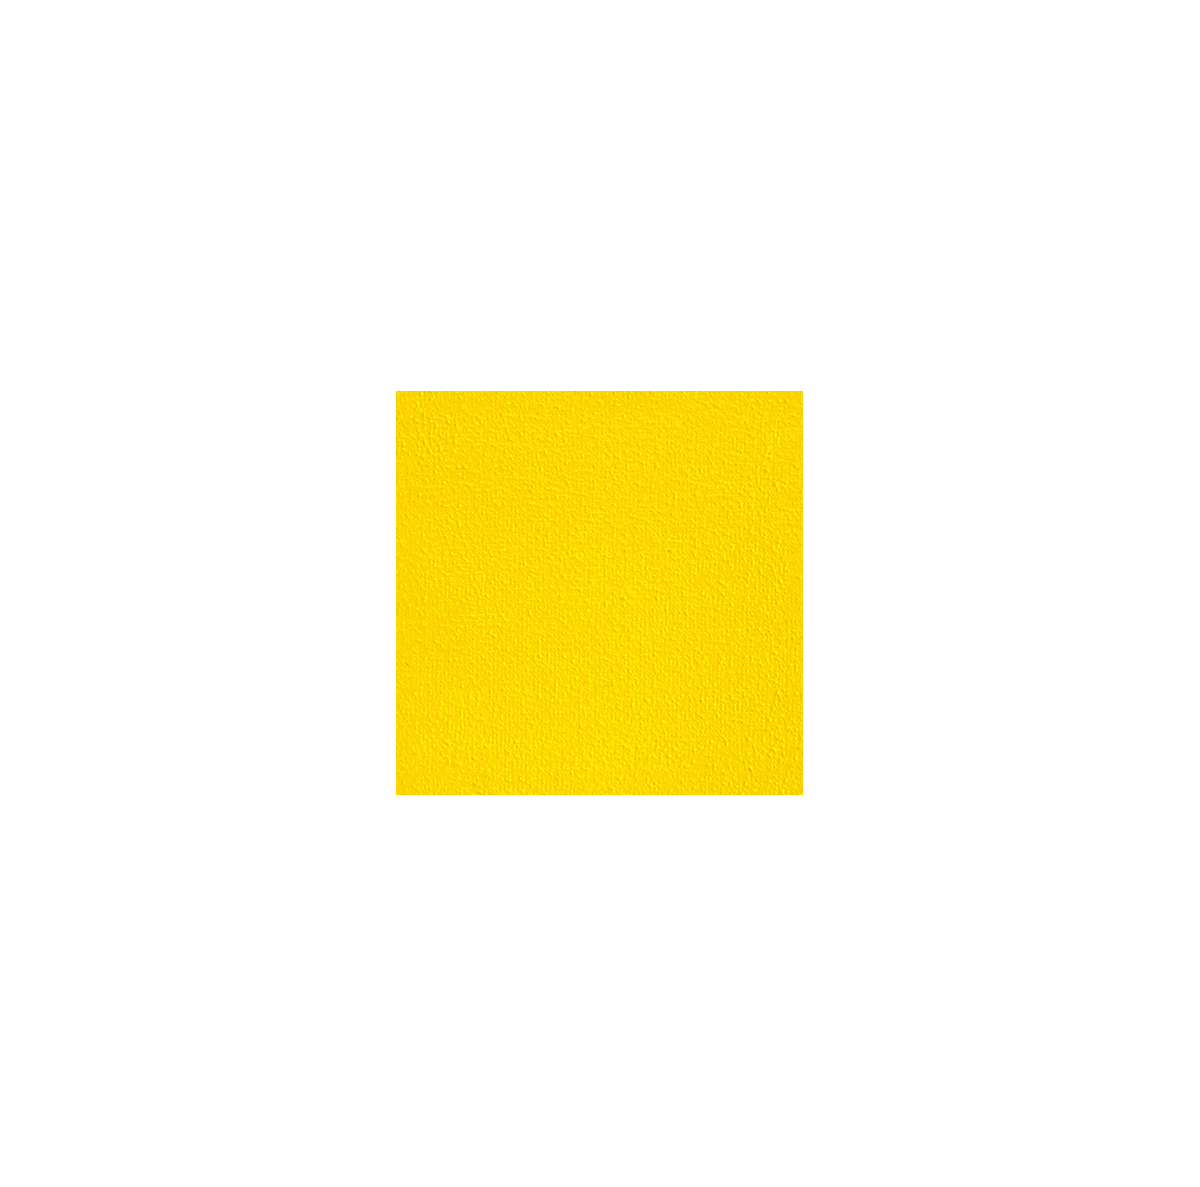 Peinture Minimal Space – Diptyque 30x30 / Peinture acrylique sur toile, vernis brillant